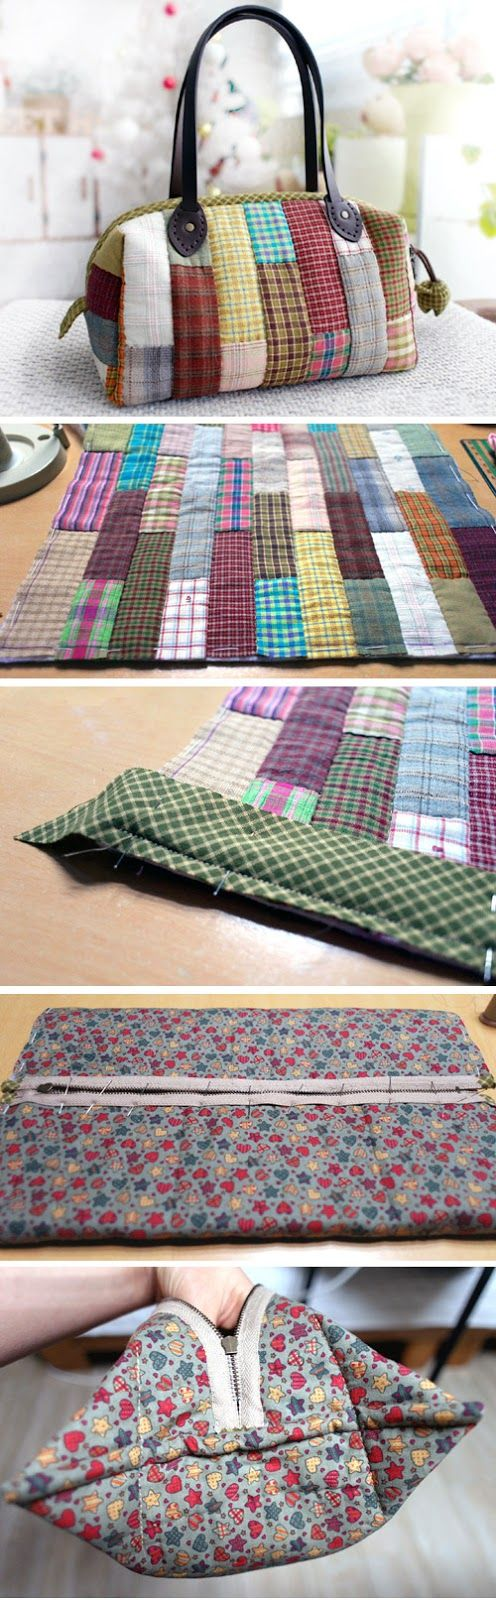 Patchwork Boston Bag. Photo Sewing Tutorial. Step by step DIY.  http://www.handmadiya.com/2016/01/boston-bag-patchwork-tutorial.html